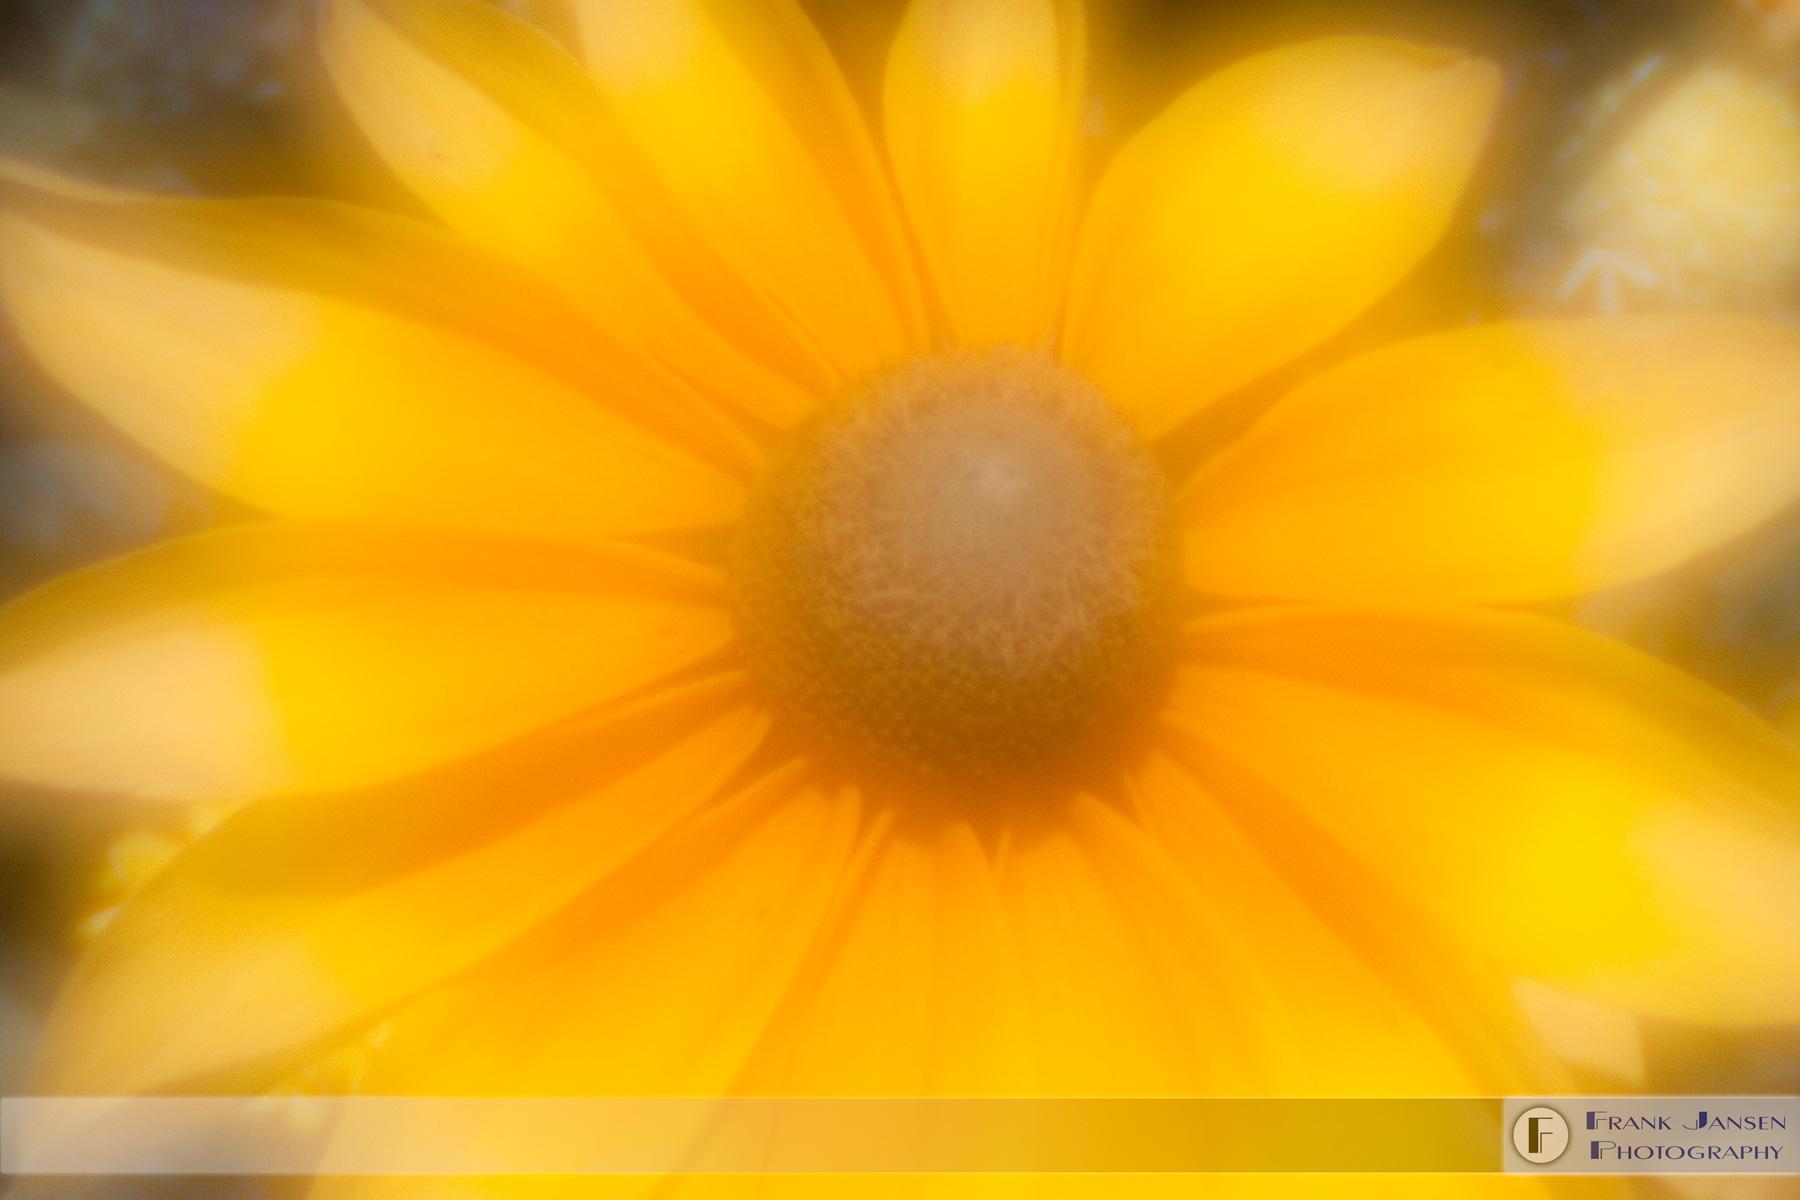 zone-plate-yellow-no1-12x18_14e0408